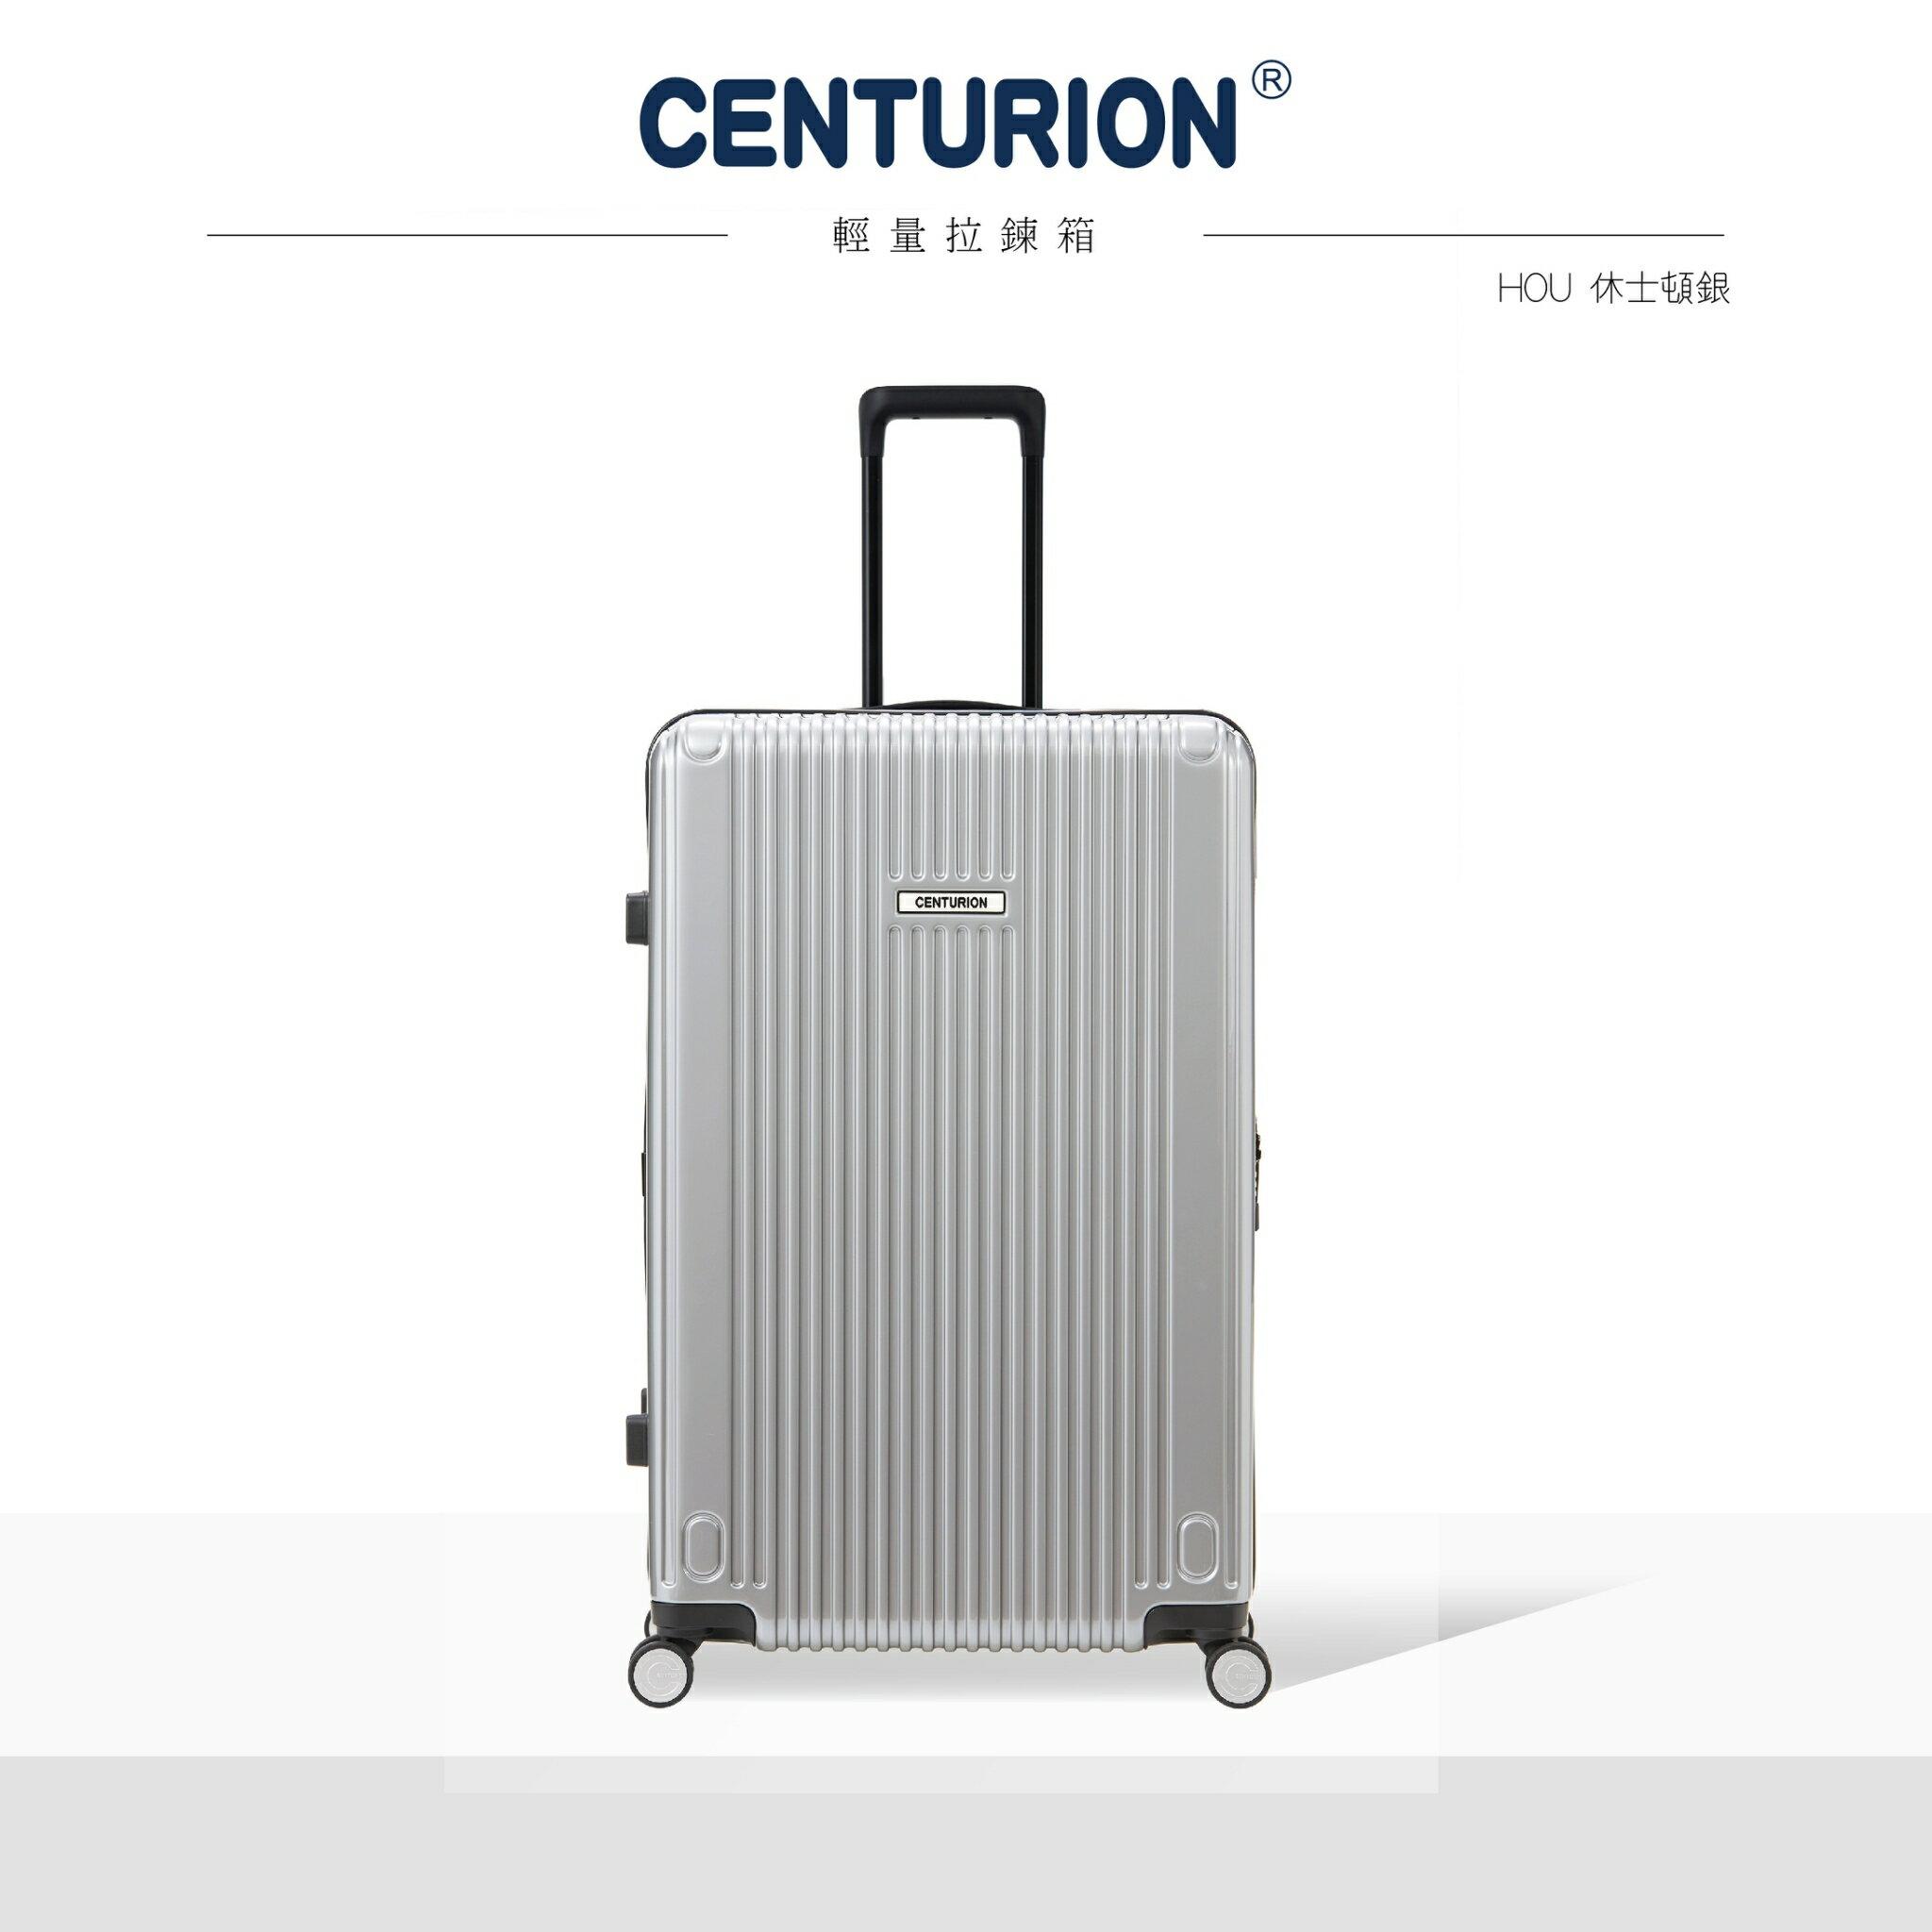 CENTURION百夫長旅行箱 SUPER CENTURION超級百夫長系列-HOU 休士頓銀